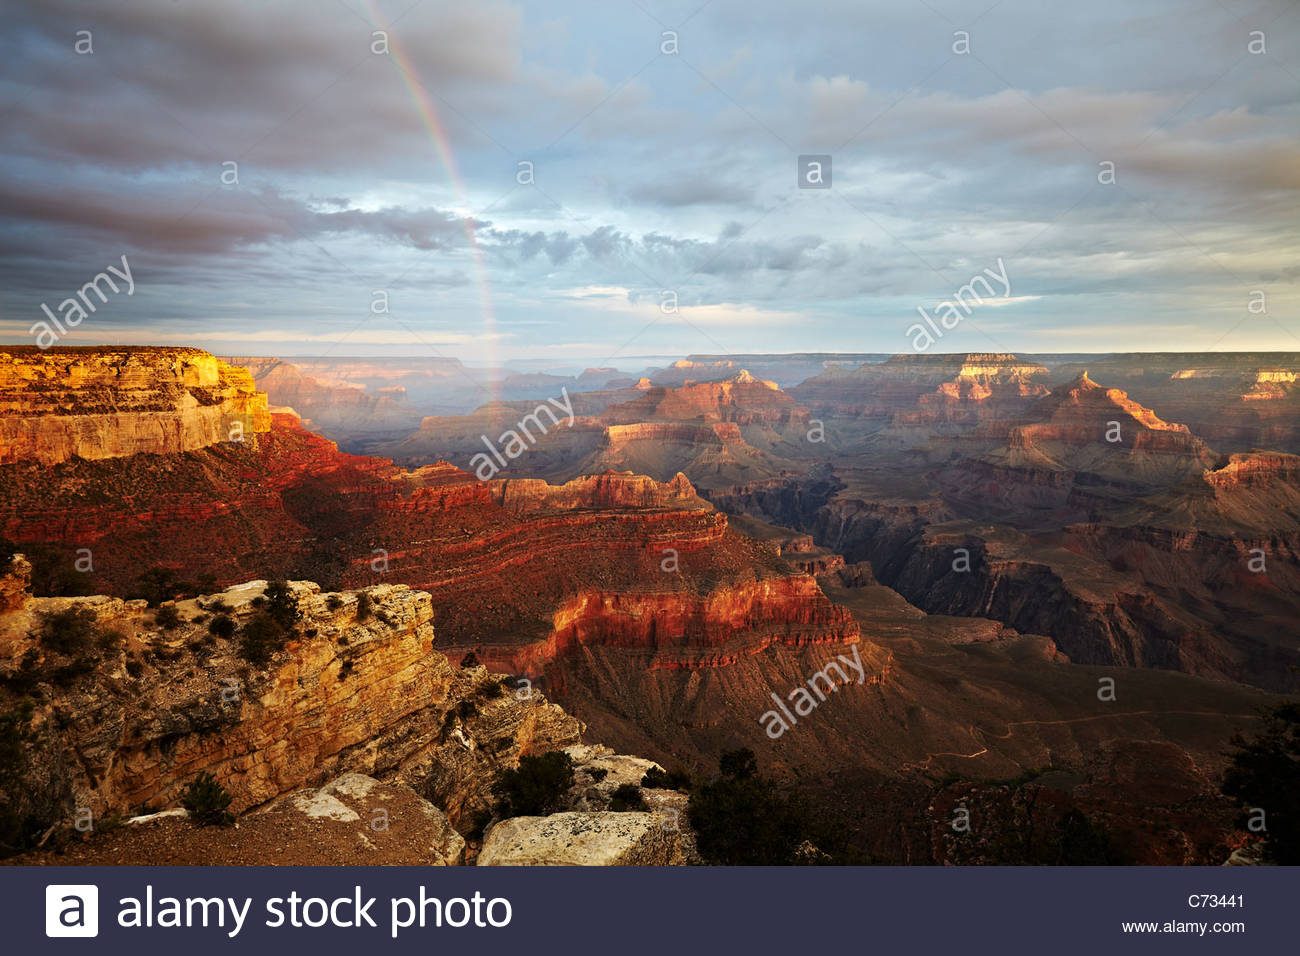 The sunrise, morning light and rainbow across the Grand Canyon, Arizona, USA - Stock Image